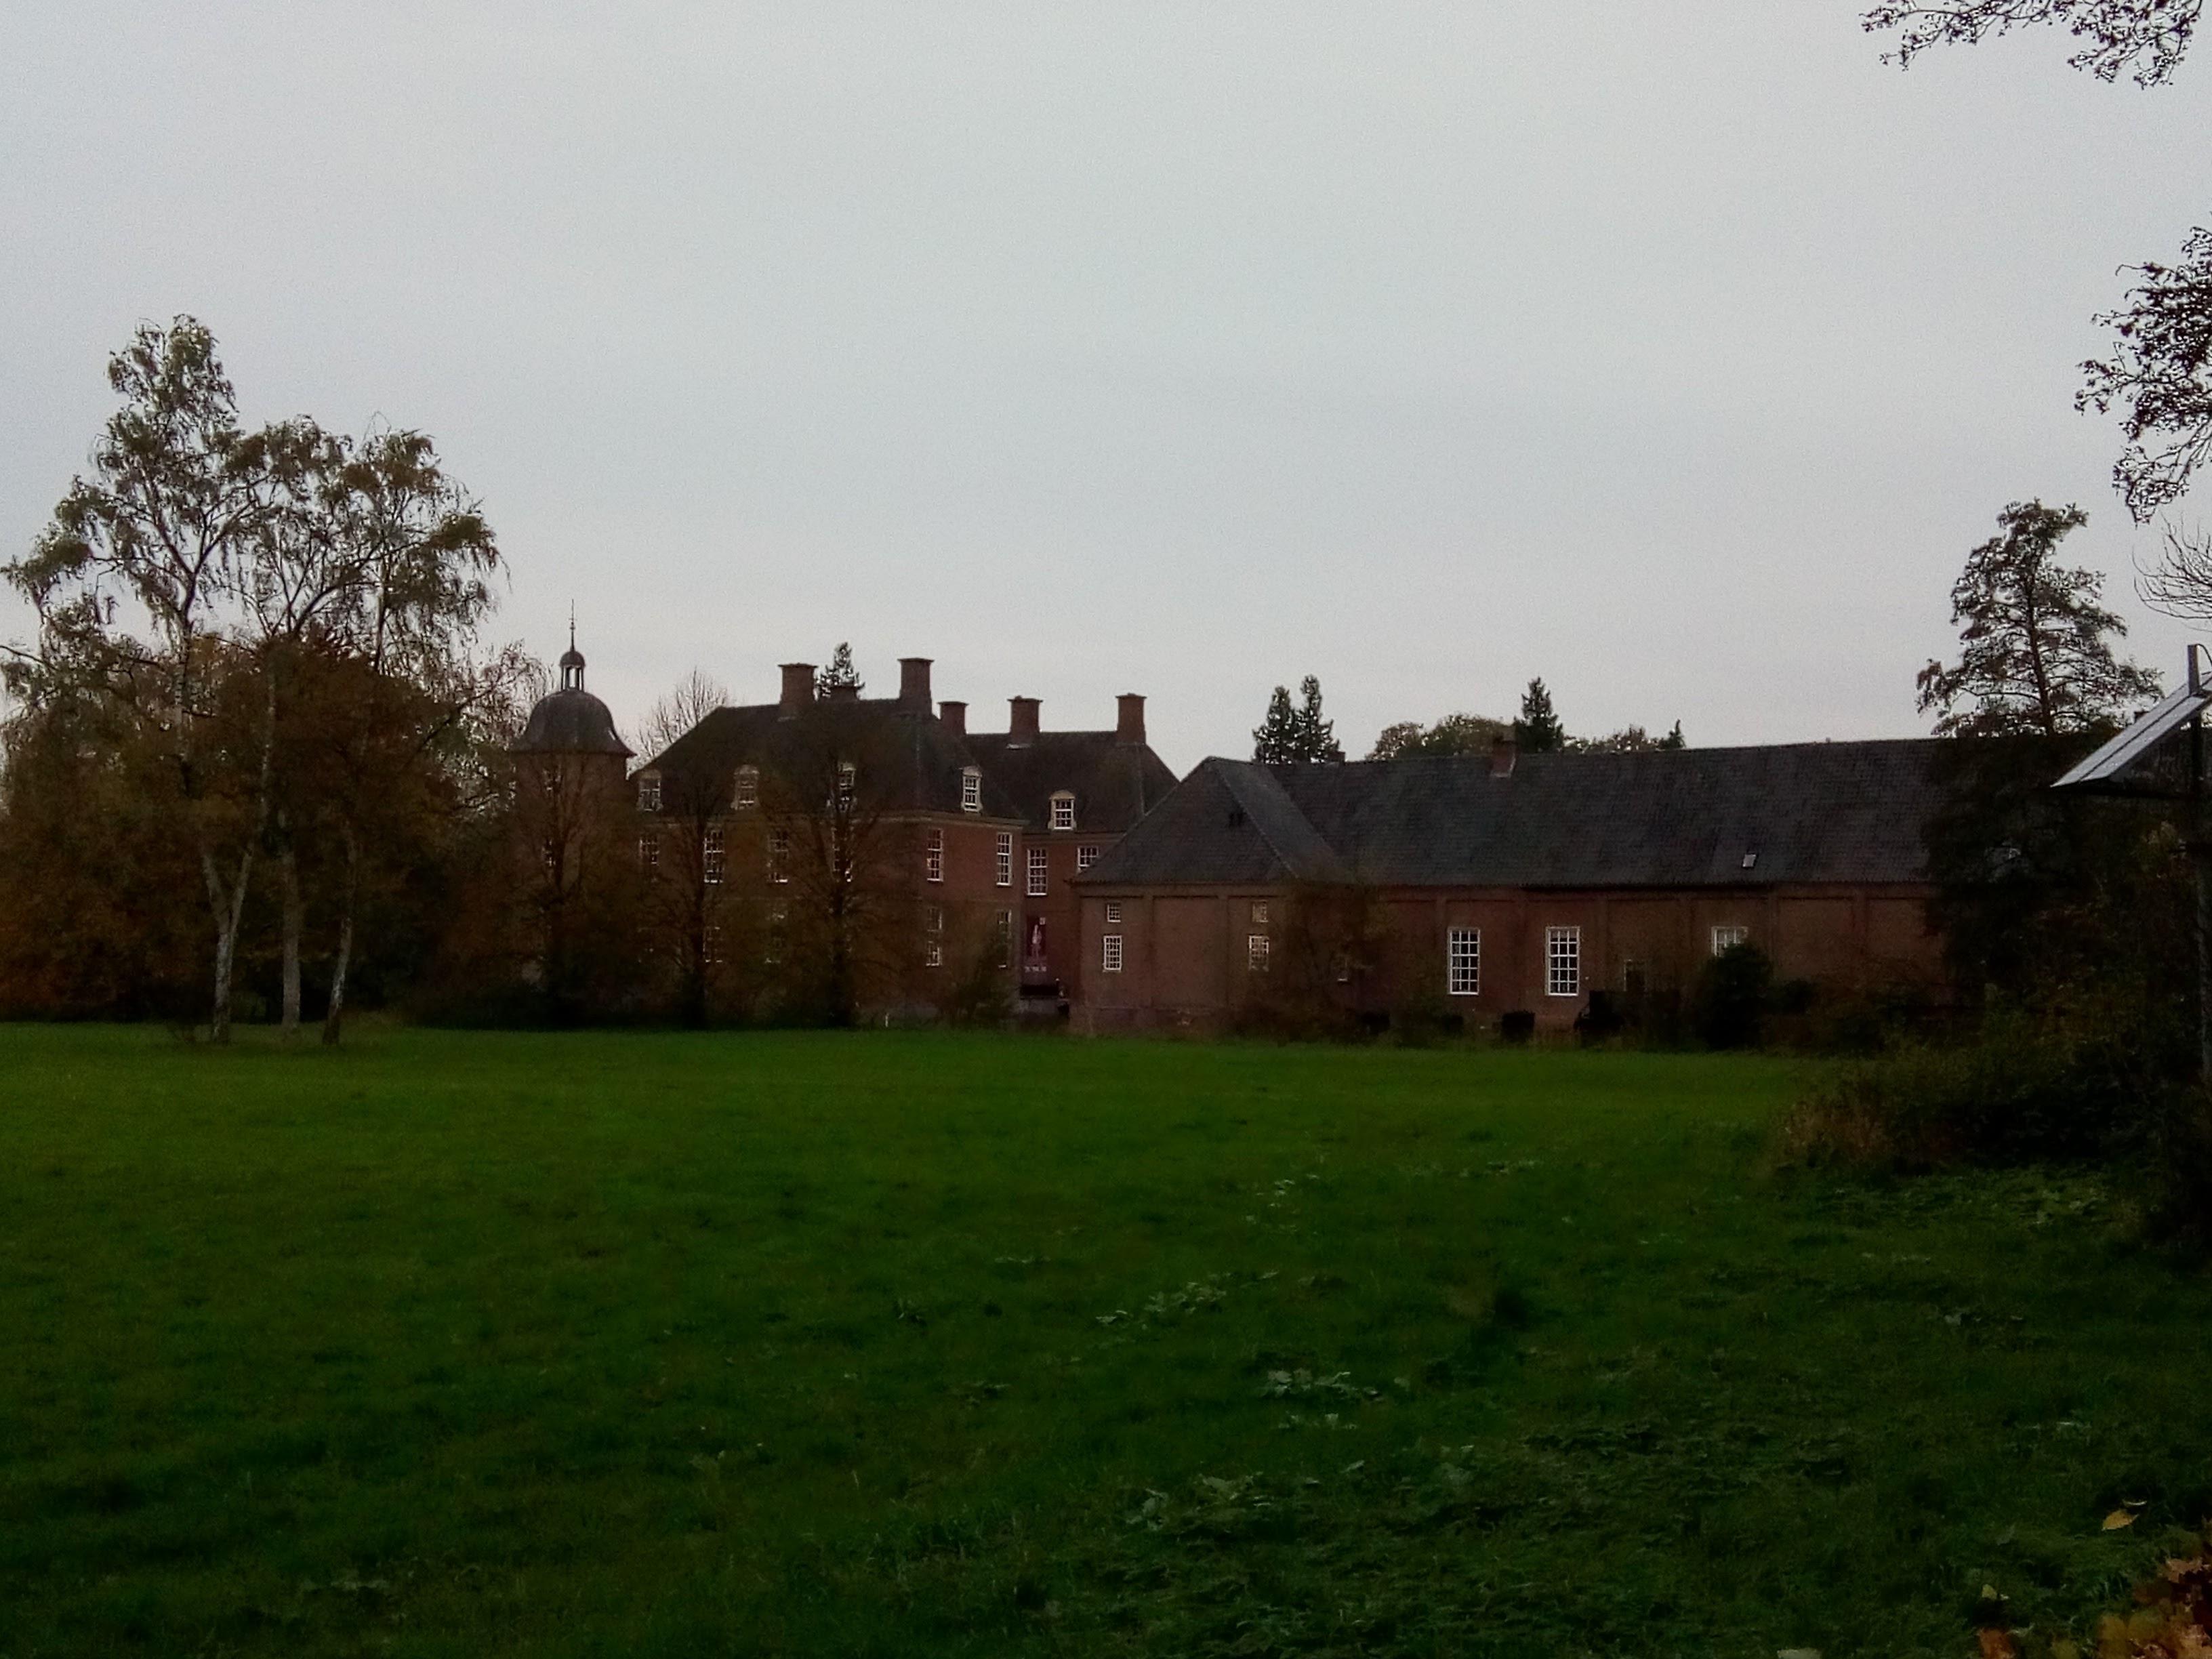 Kasteel Slangenburg in Doetinchem